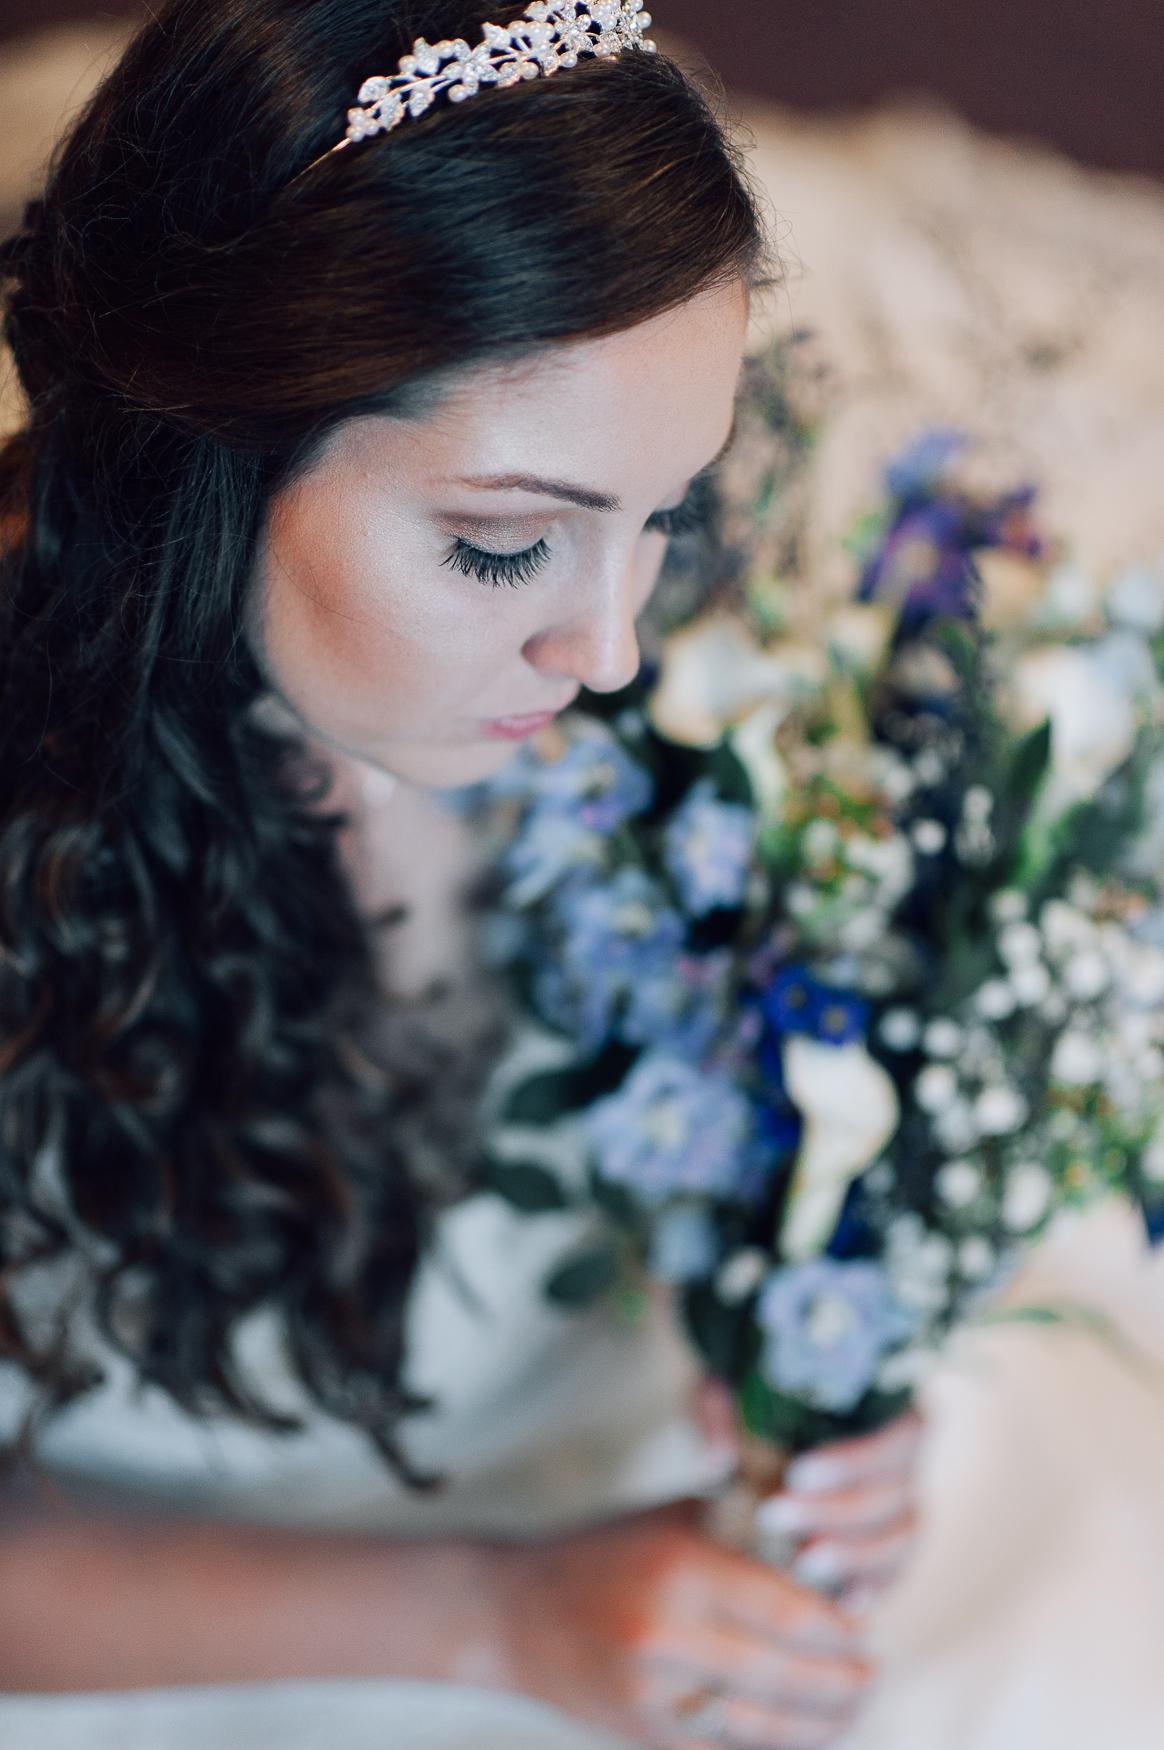 virginiawedding_rusticwedding_harrisonburg_youseephotography_JanieHunter (21).jpg